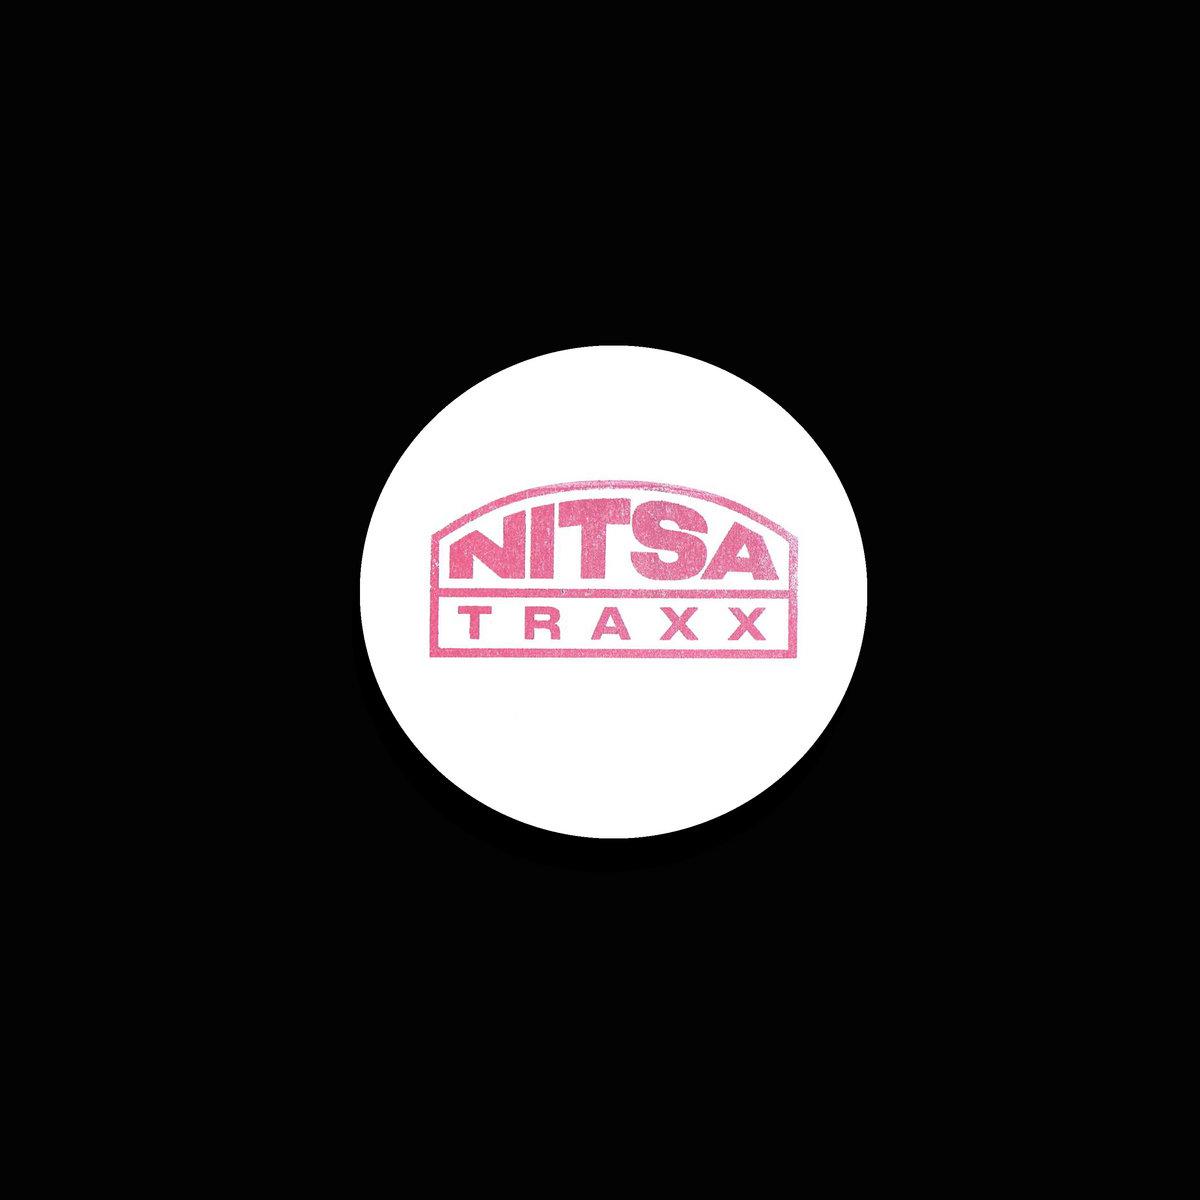 Nitsa Traxx estrena su segunda temporada con JMII y Svreca ...